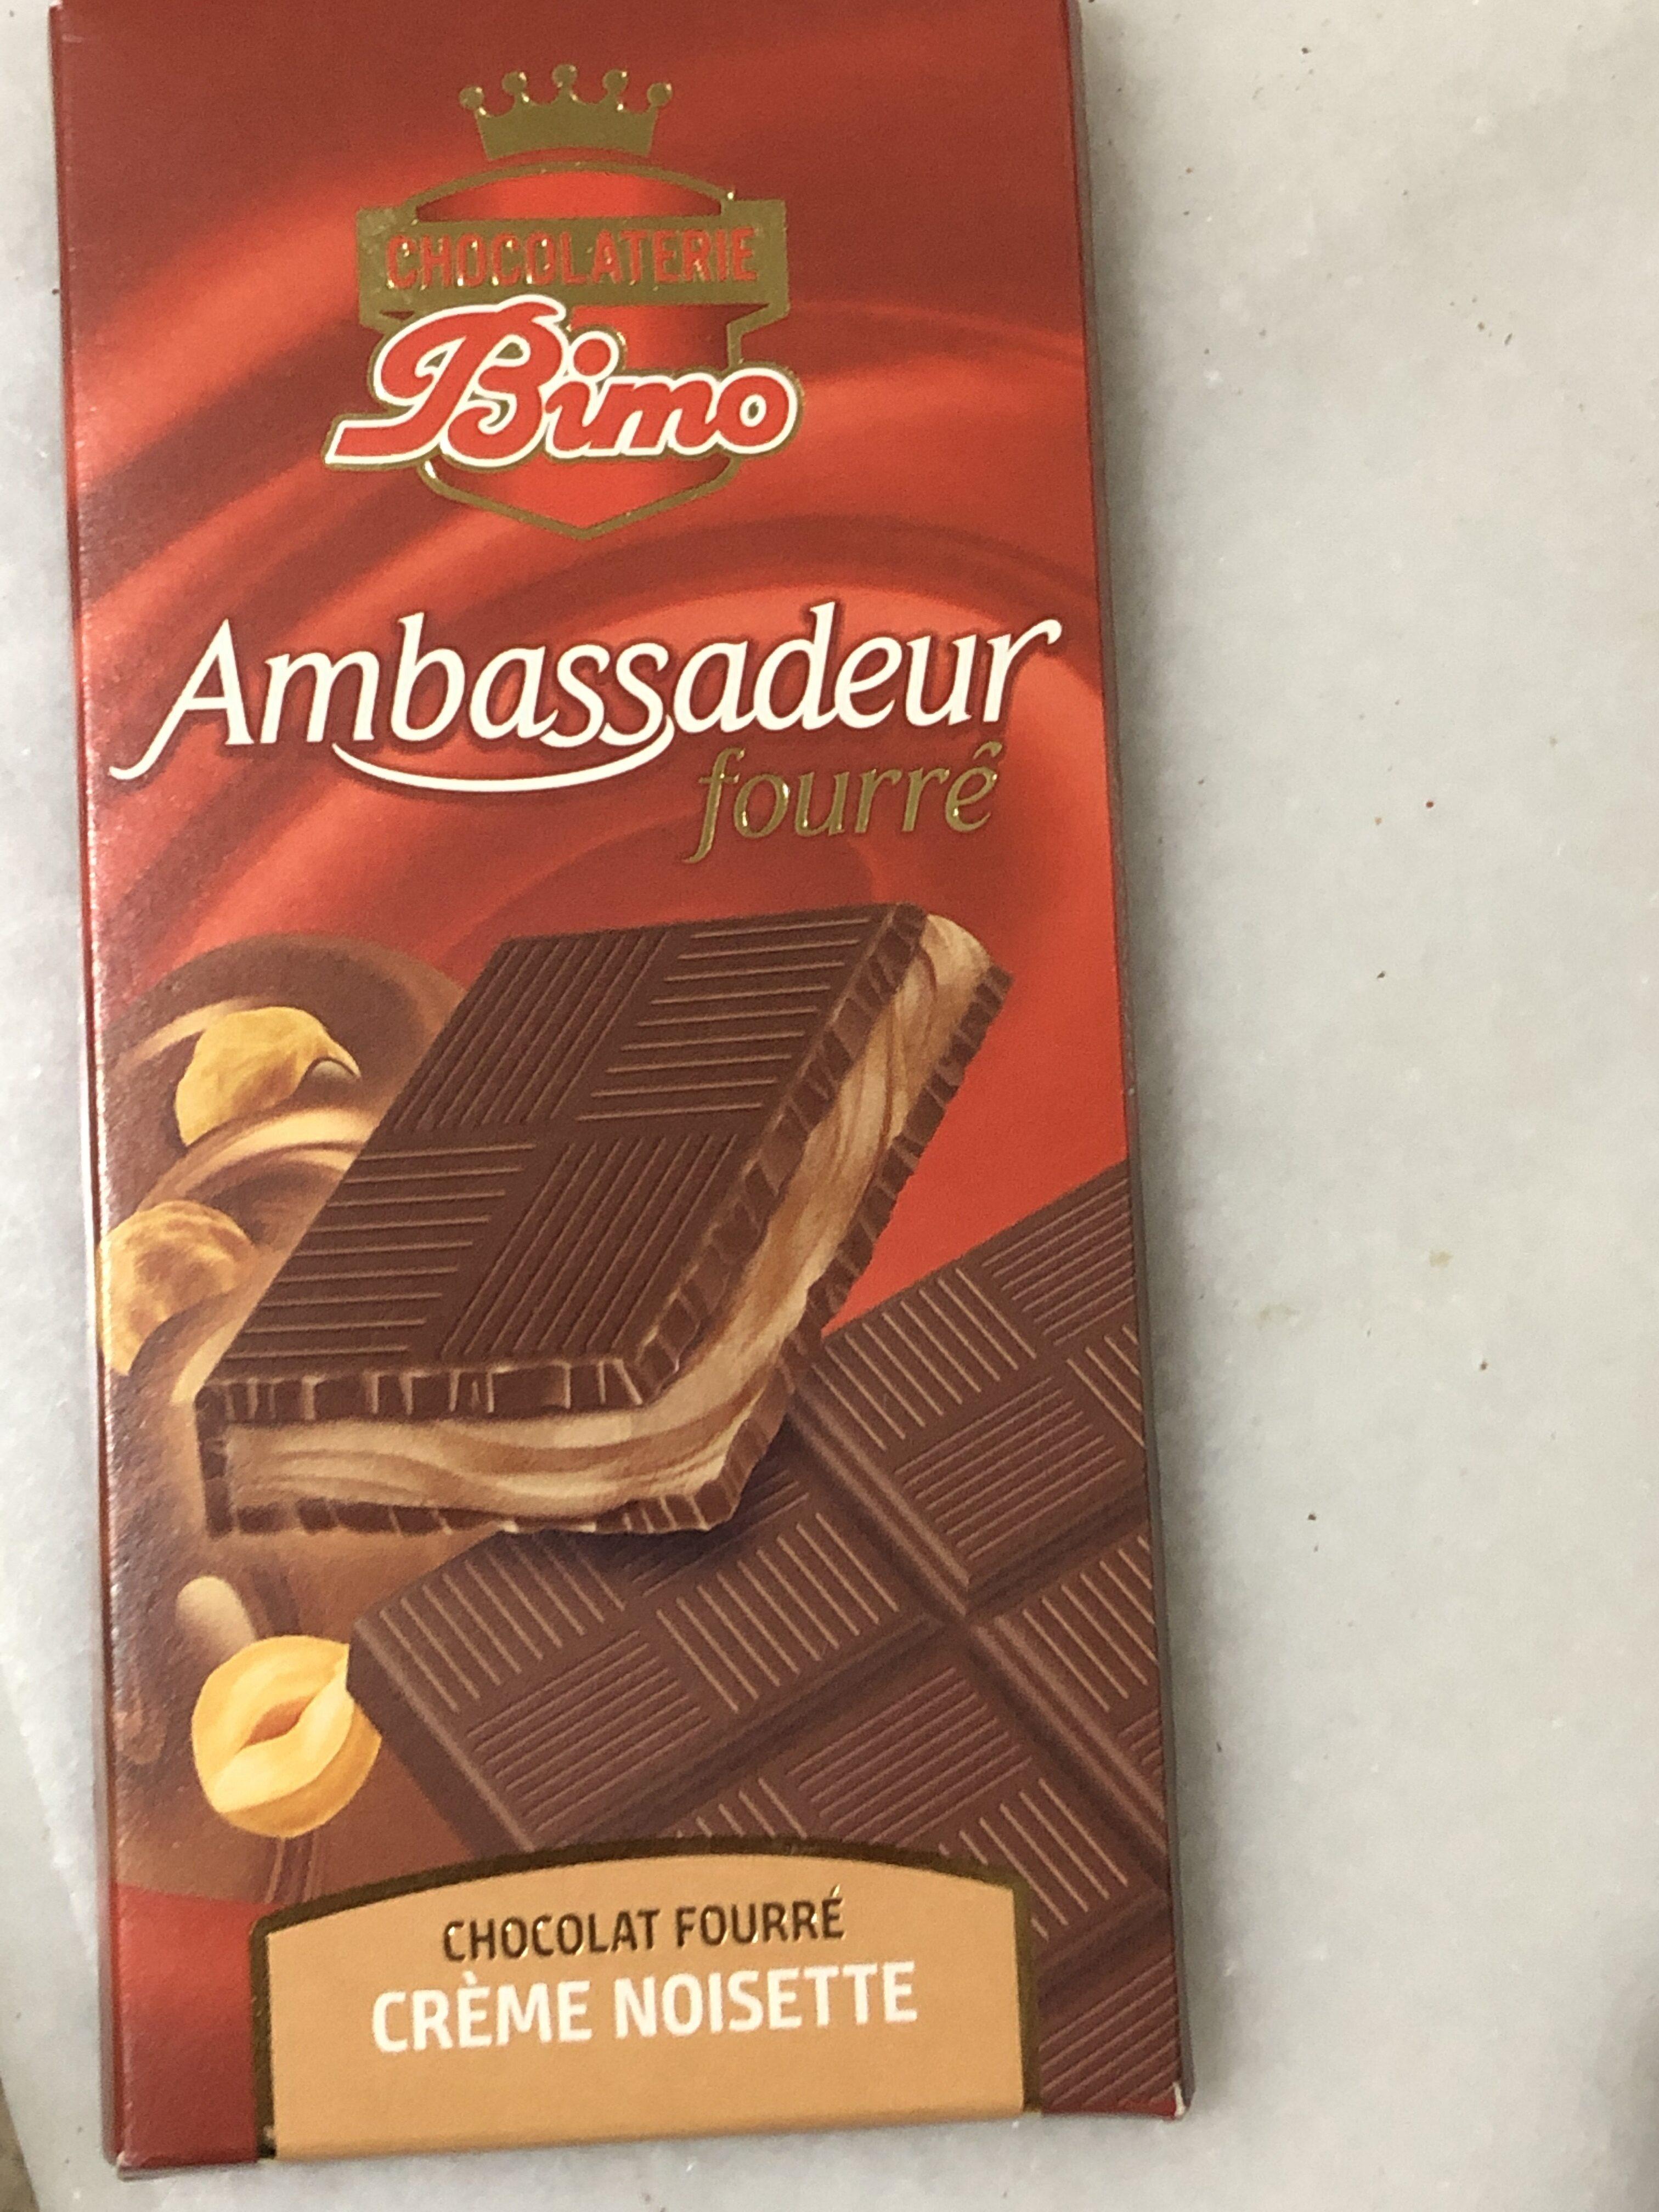 Ambassadeur fourré - Product - fr